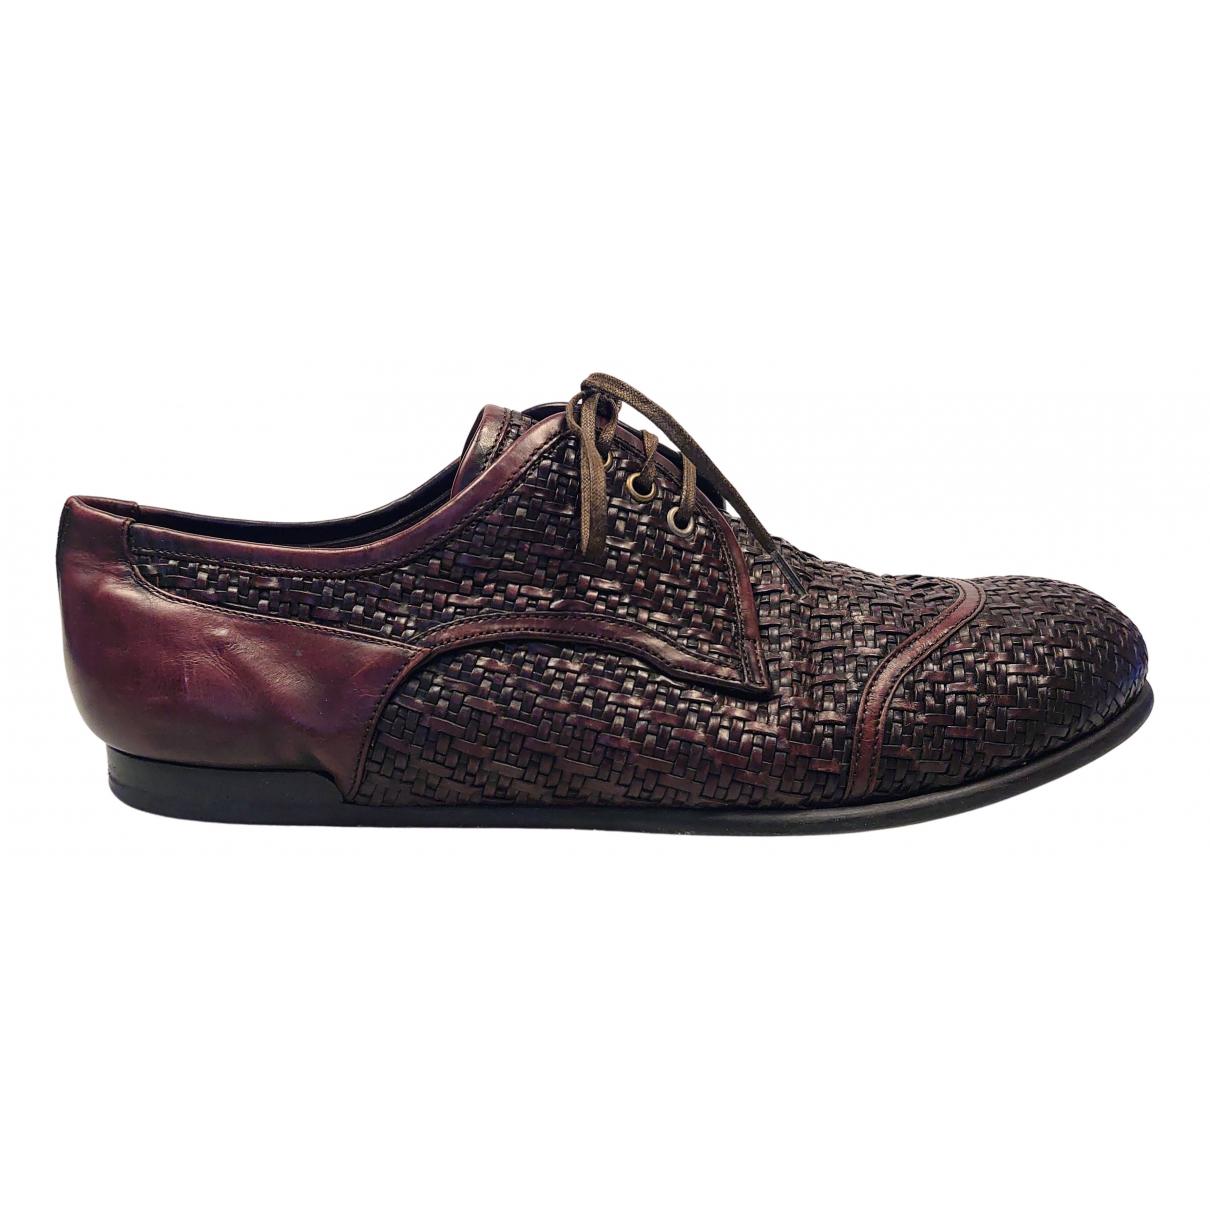 Dolce & Gabbana N Burgundy Leather Lace ups for Men 10 UK